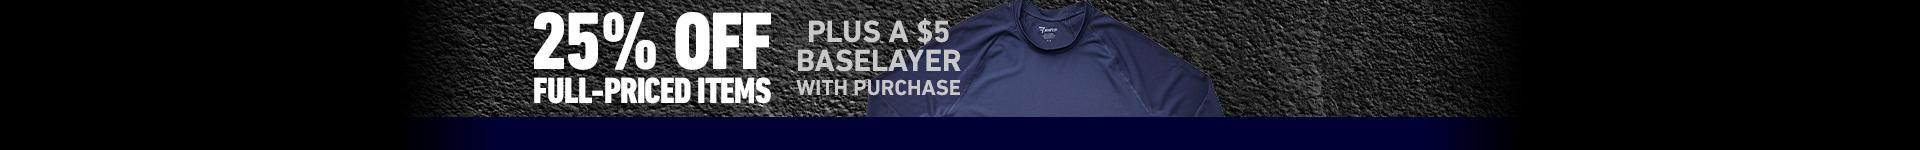 25% Off Full Price + $5 PWP Baselayer - BLACKFRIDAY2020